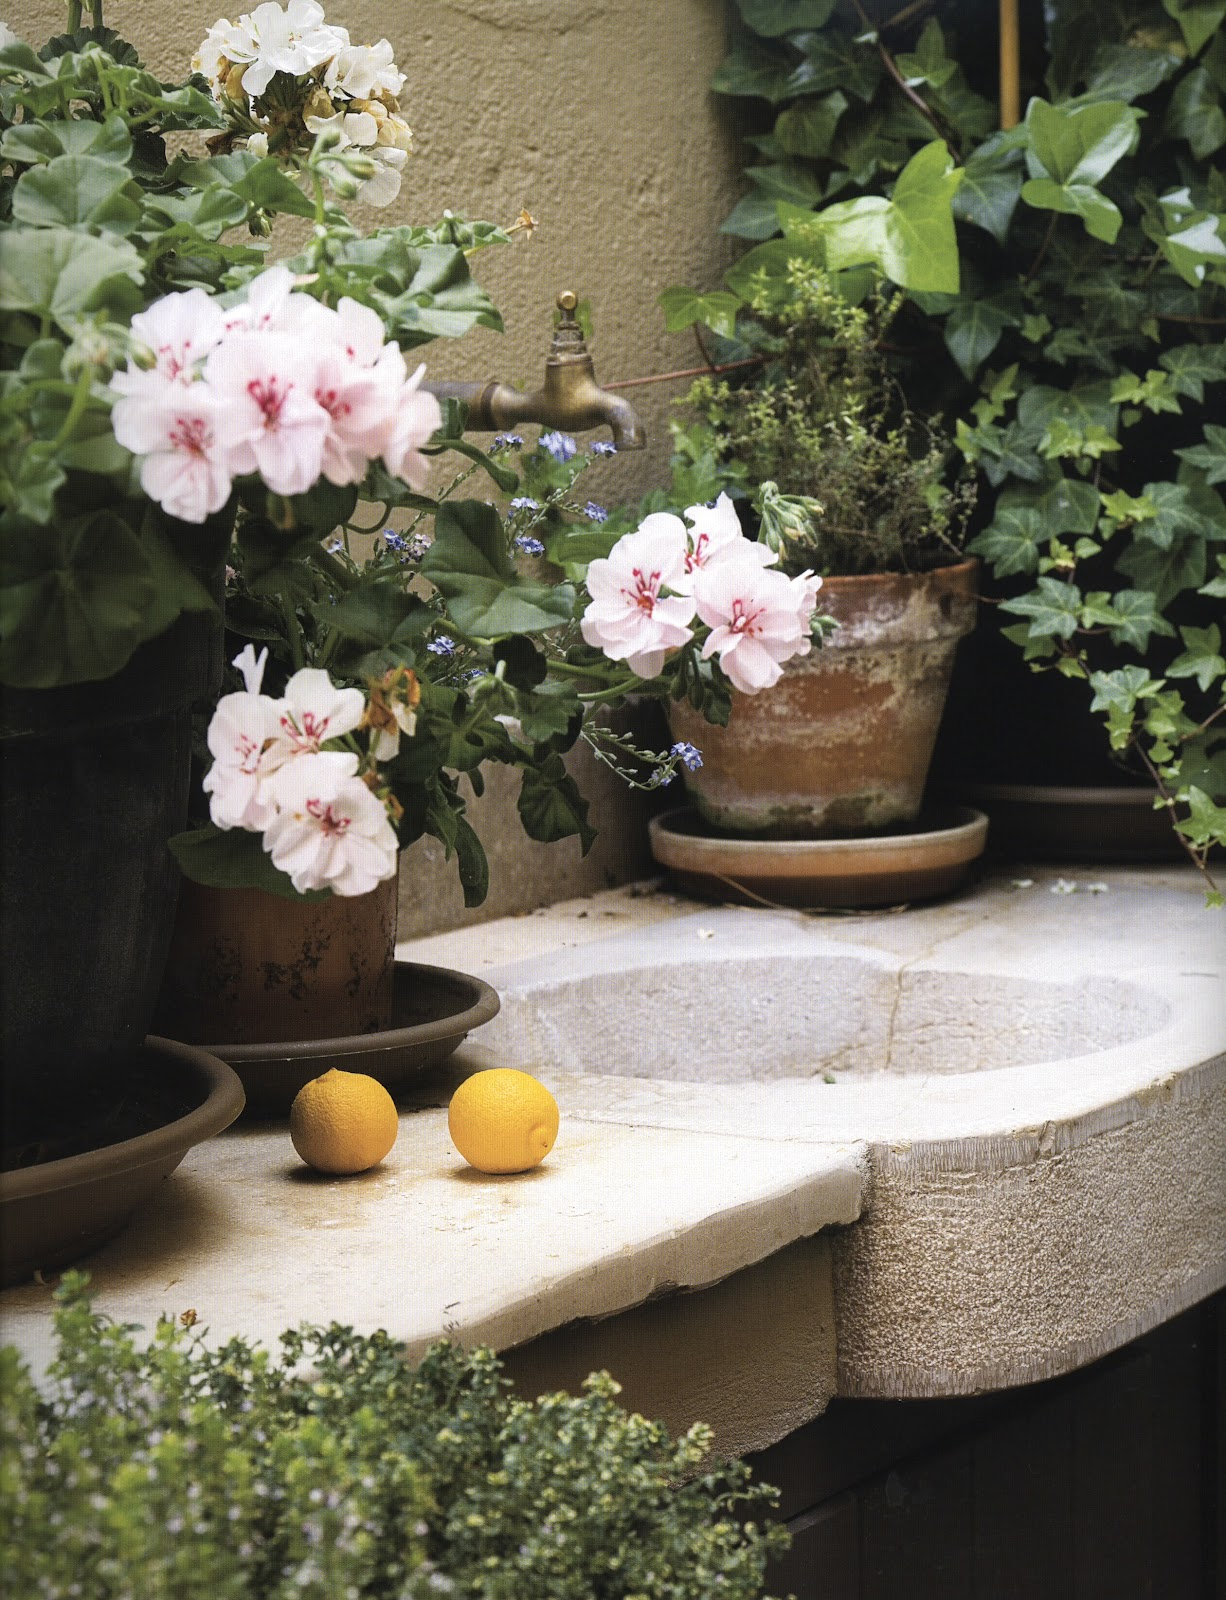 ... on Pinterest Outdoor Sinks, Garden Sink and Outdoor Garden Sink